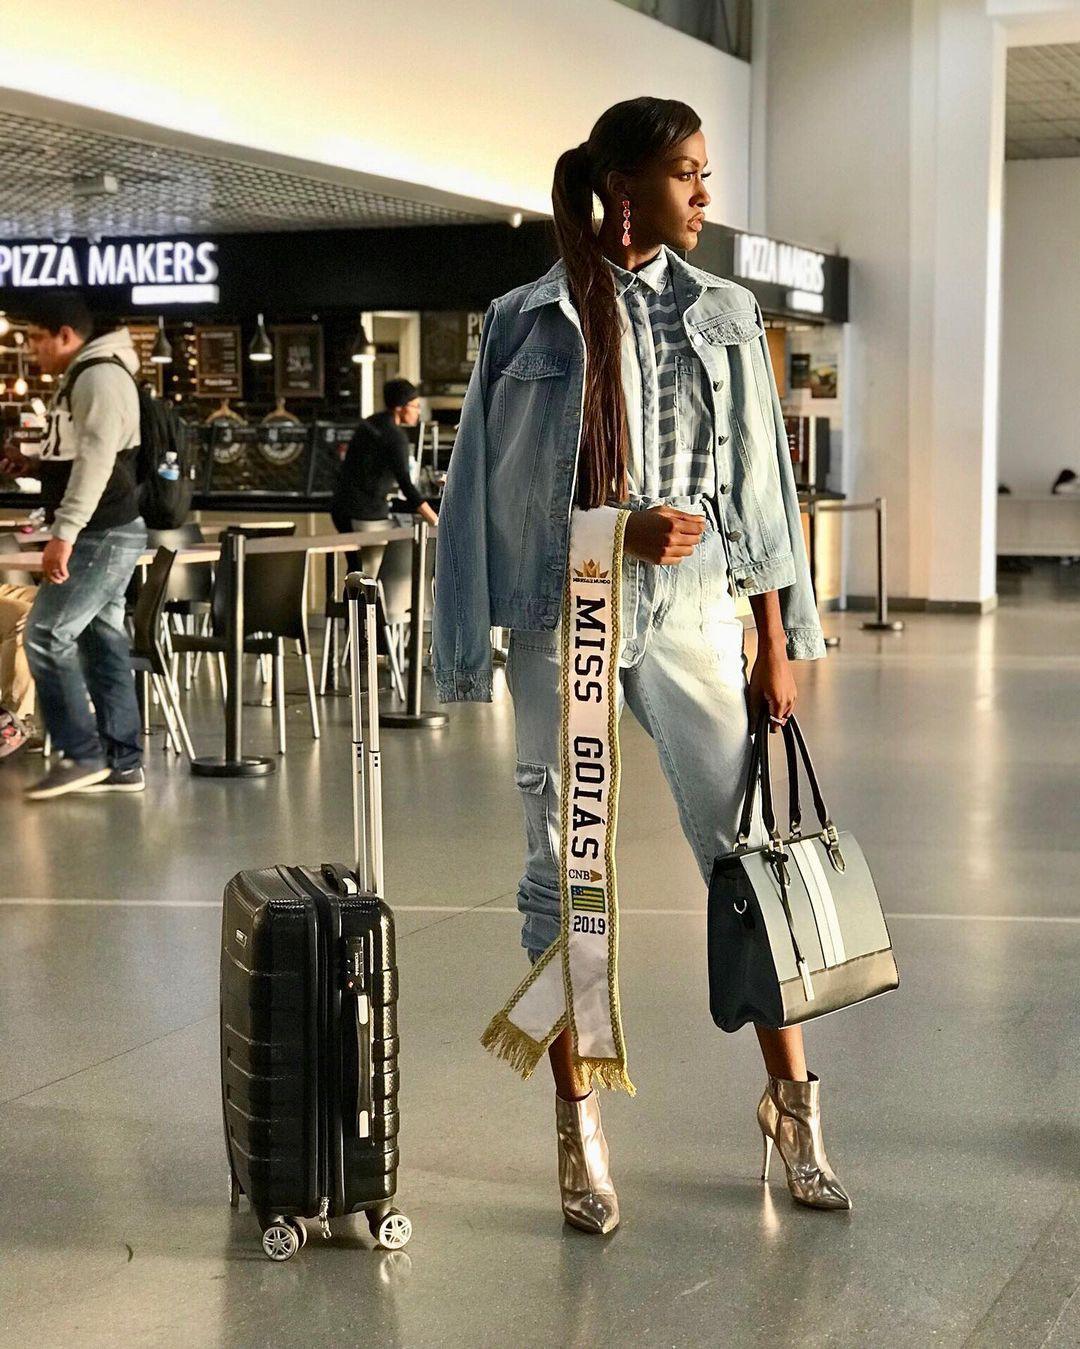 fernanda bispo, top 20 de miss brasil mundo 2019. - Página 5 F0dul710